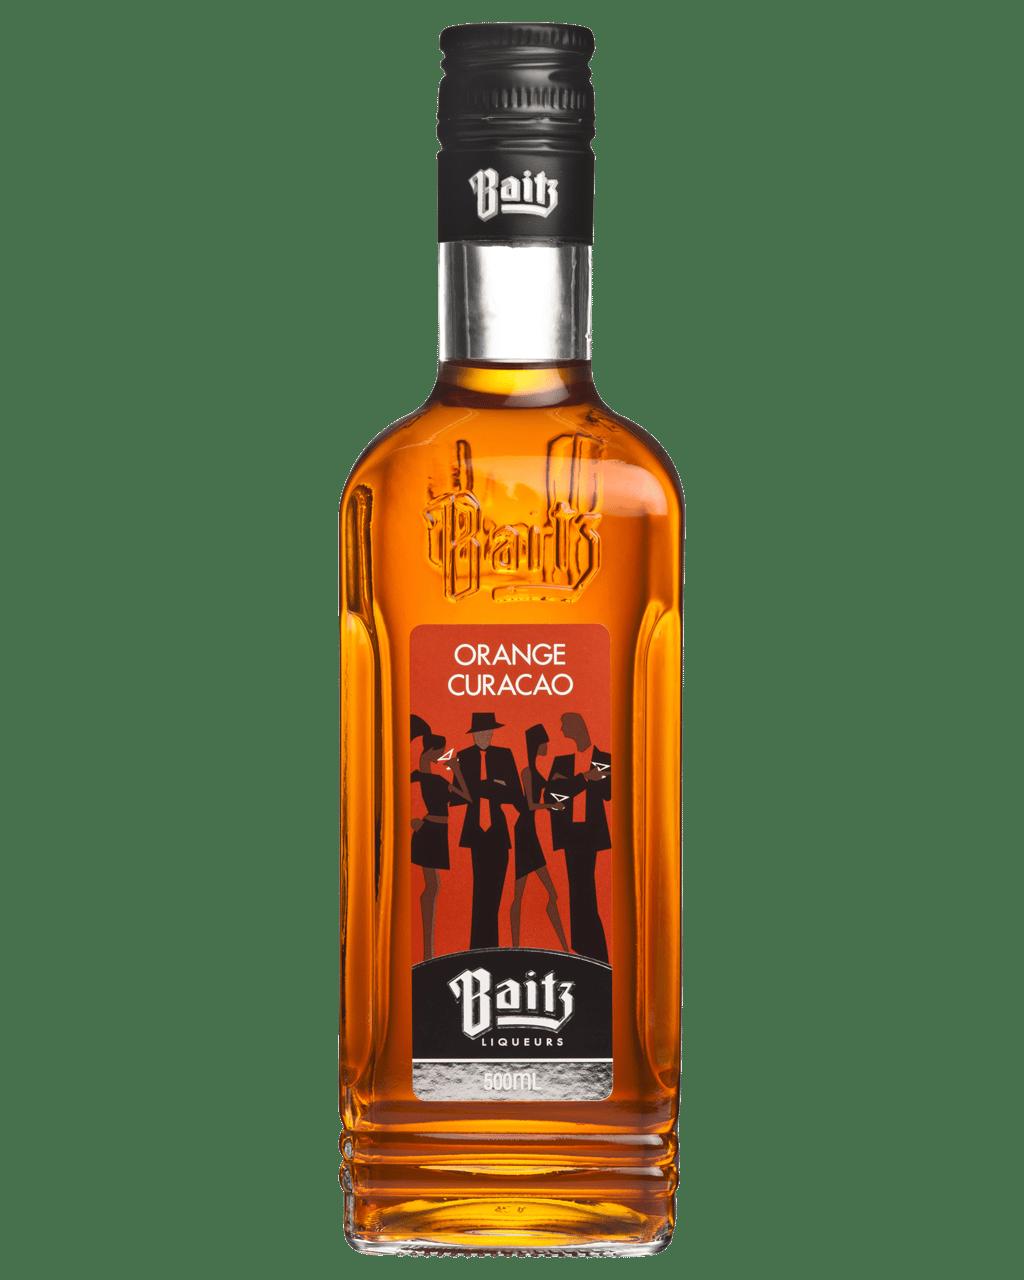 64303d18e2c Baitz Orange Curacao Liqueur 500mL